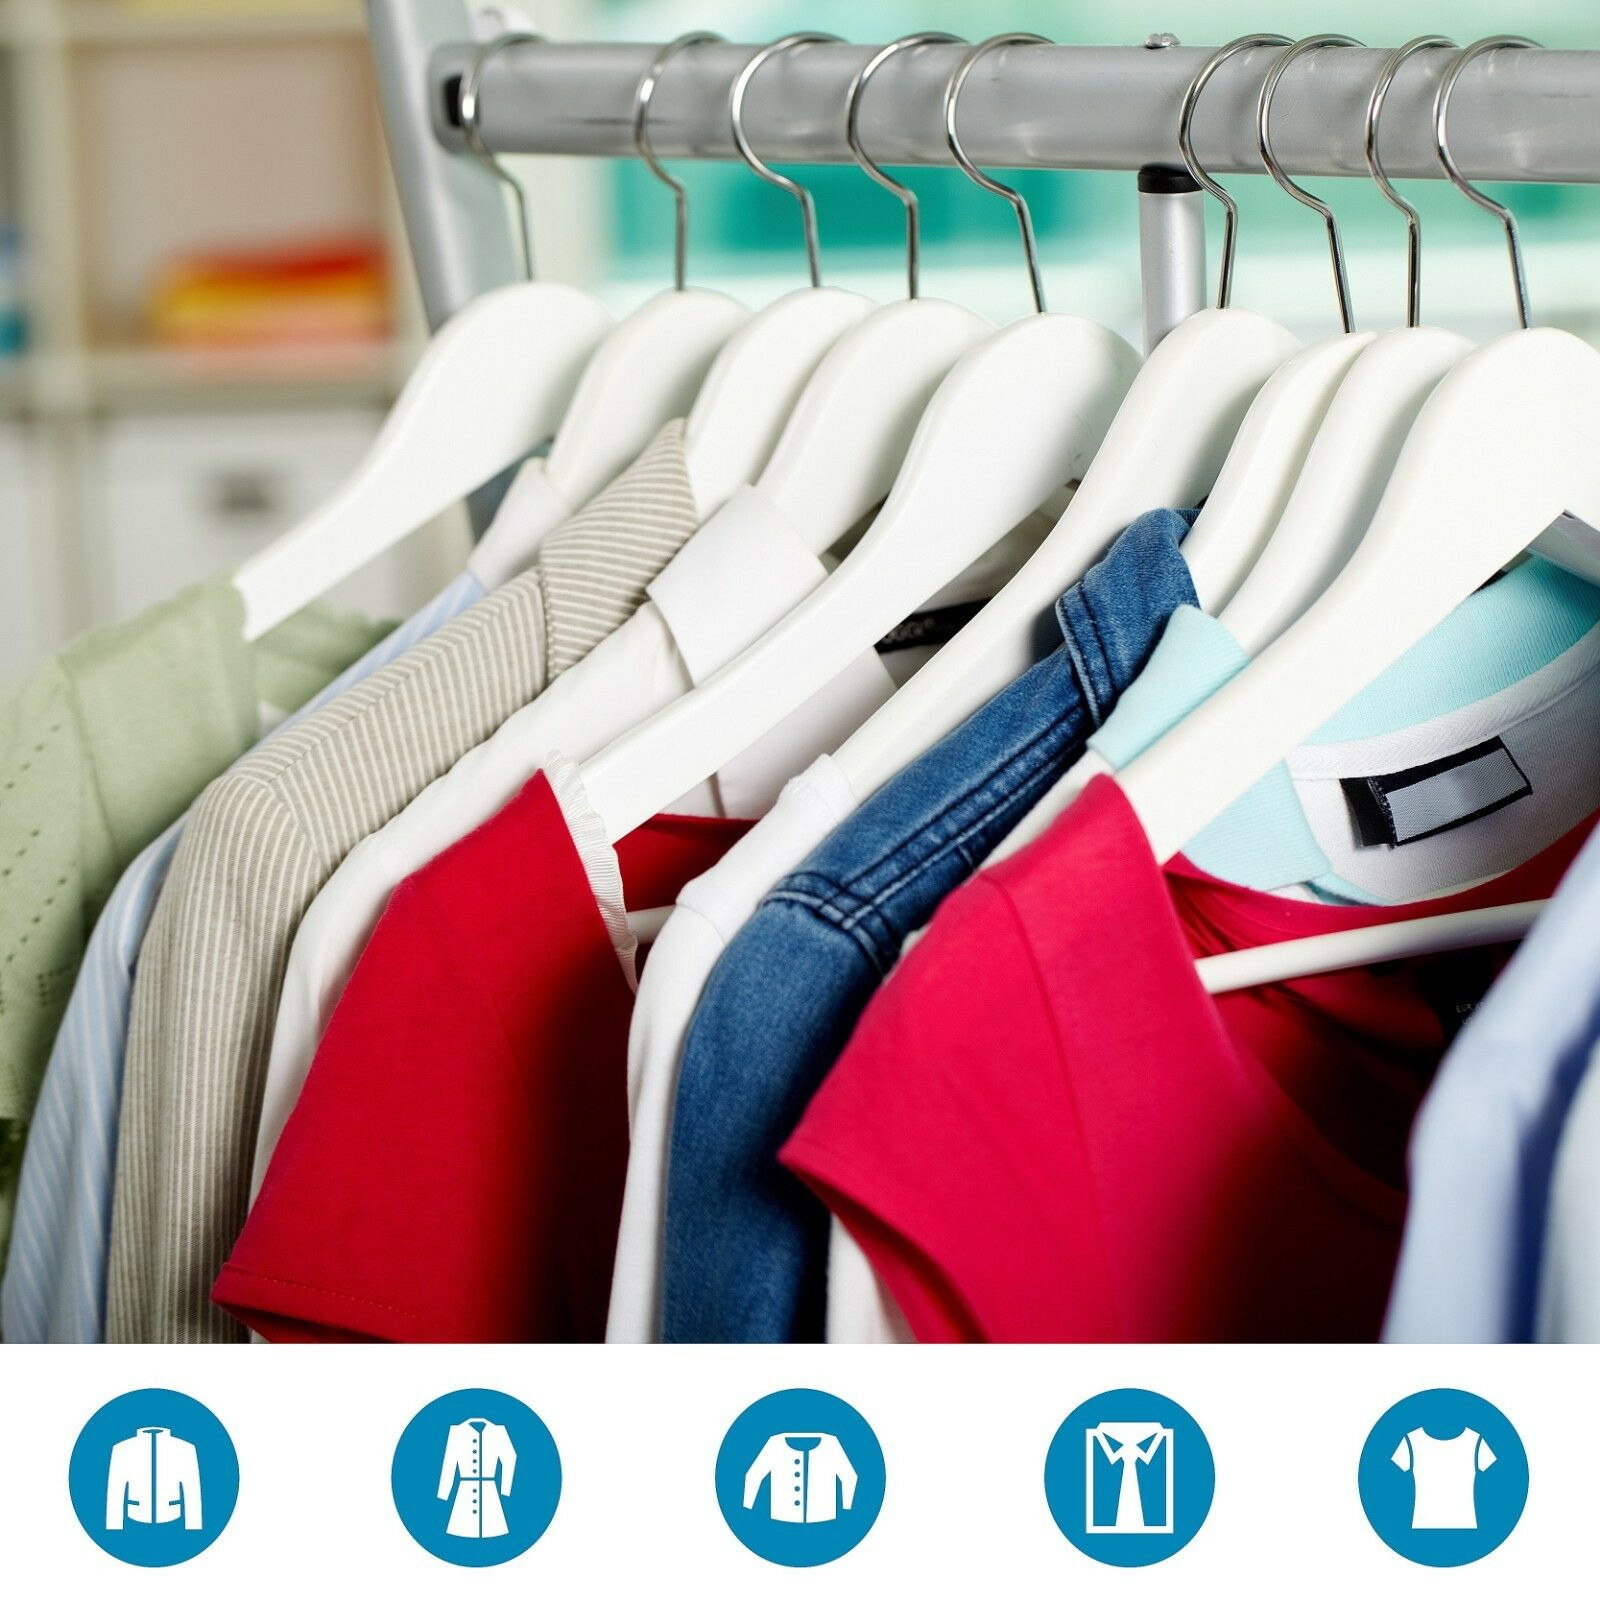 2 2 2 - 200 Weiß Wooden Coat Hangers Suit Trouser Garment Clothes Coat Hanger Bar 98a5ba